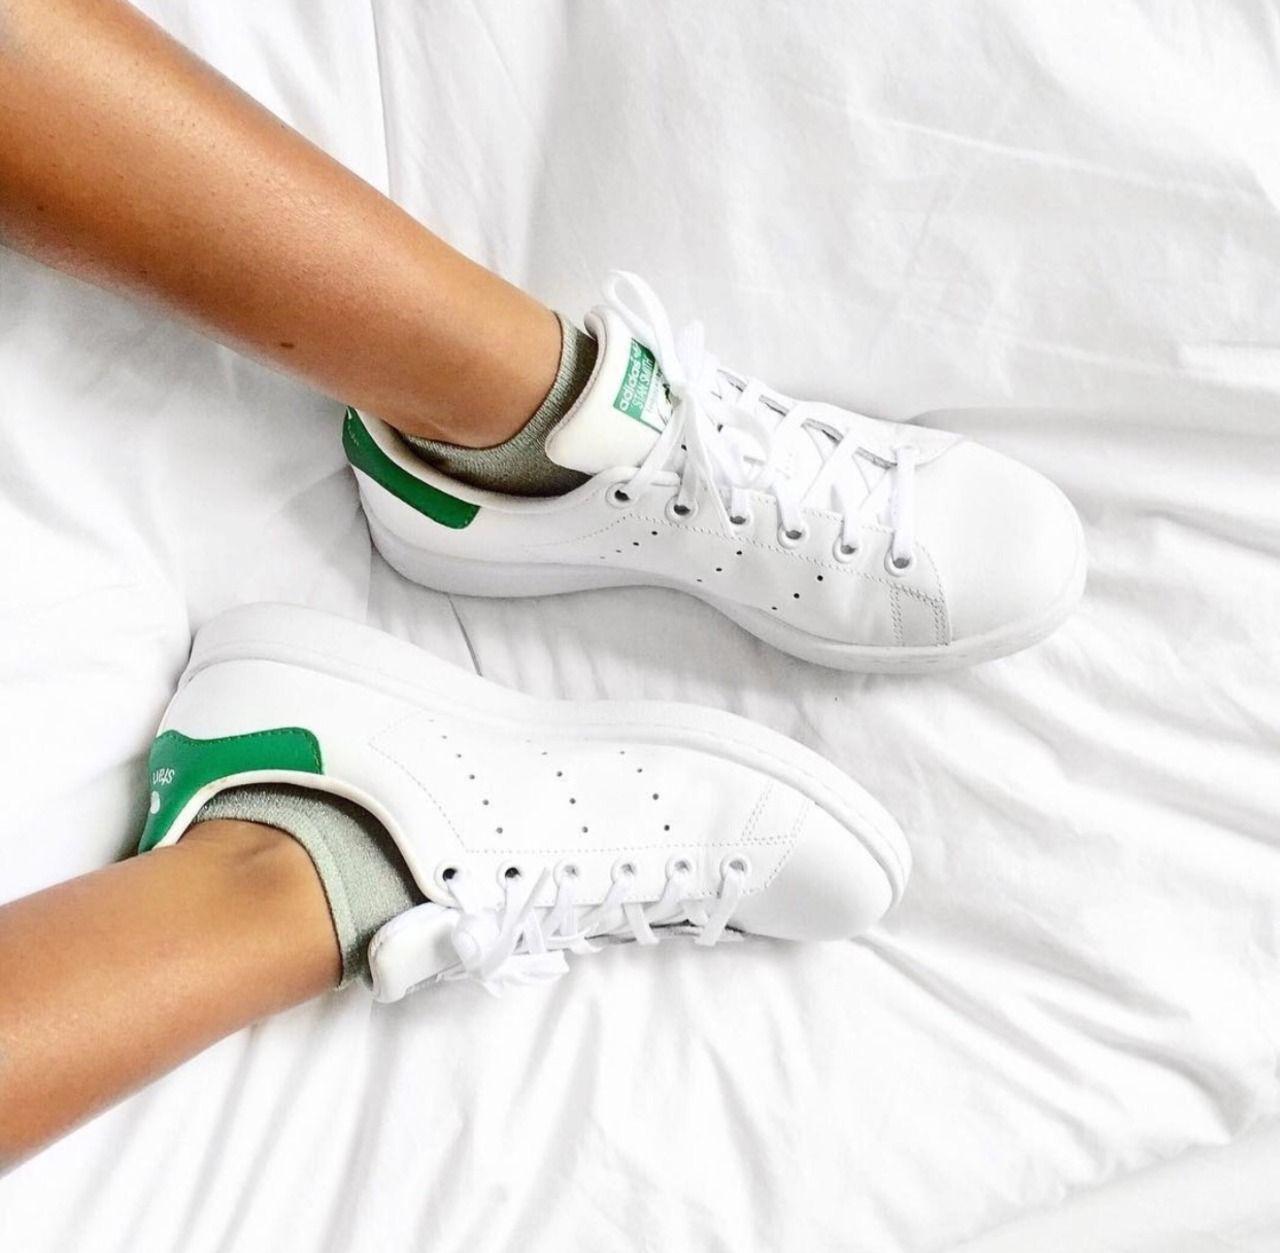 Untitled   Scarpe adidas, Scarpe, Adidas